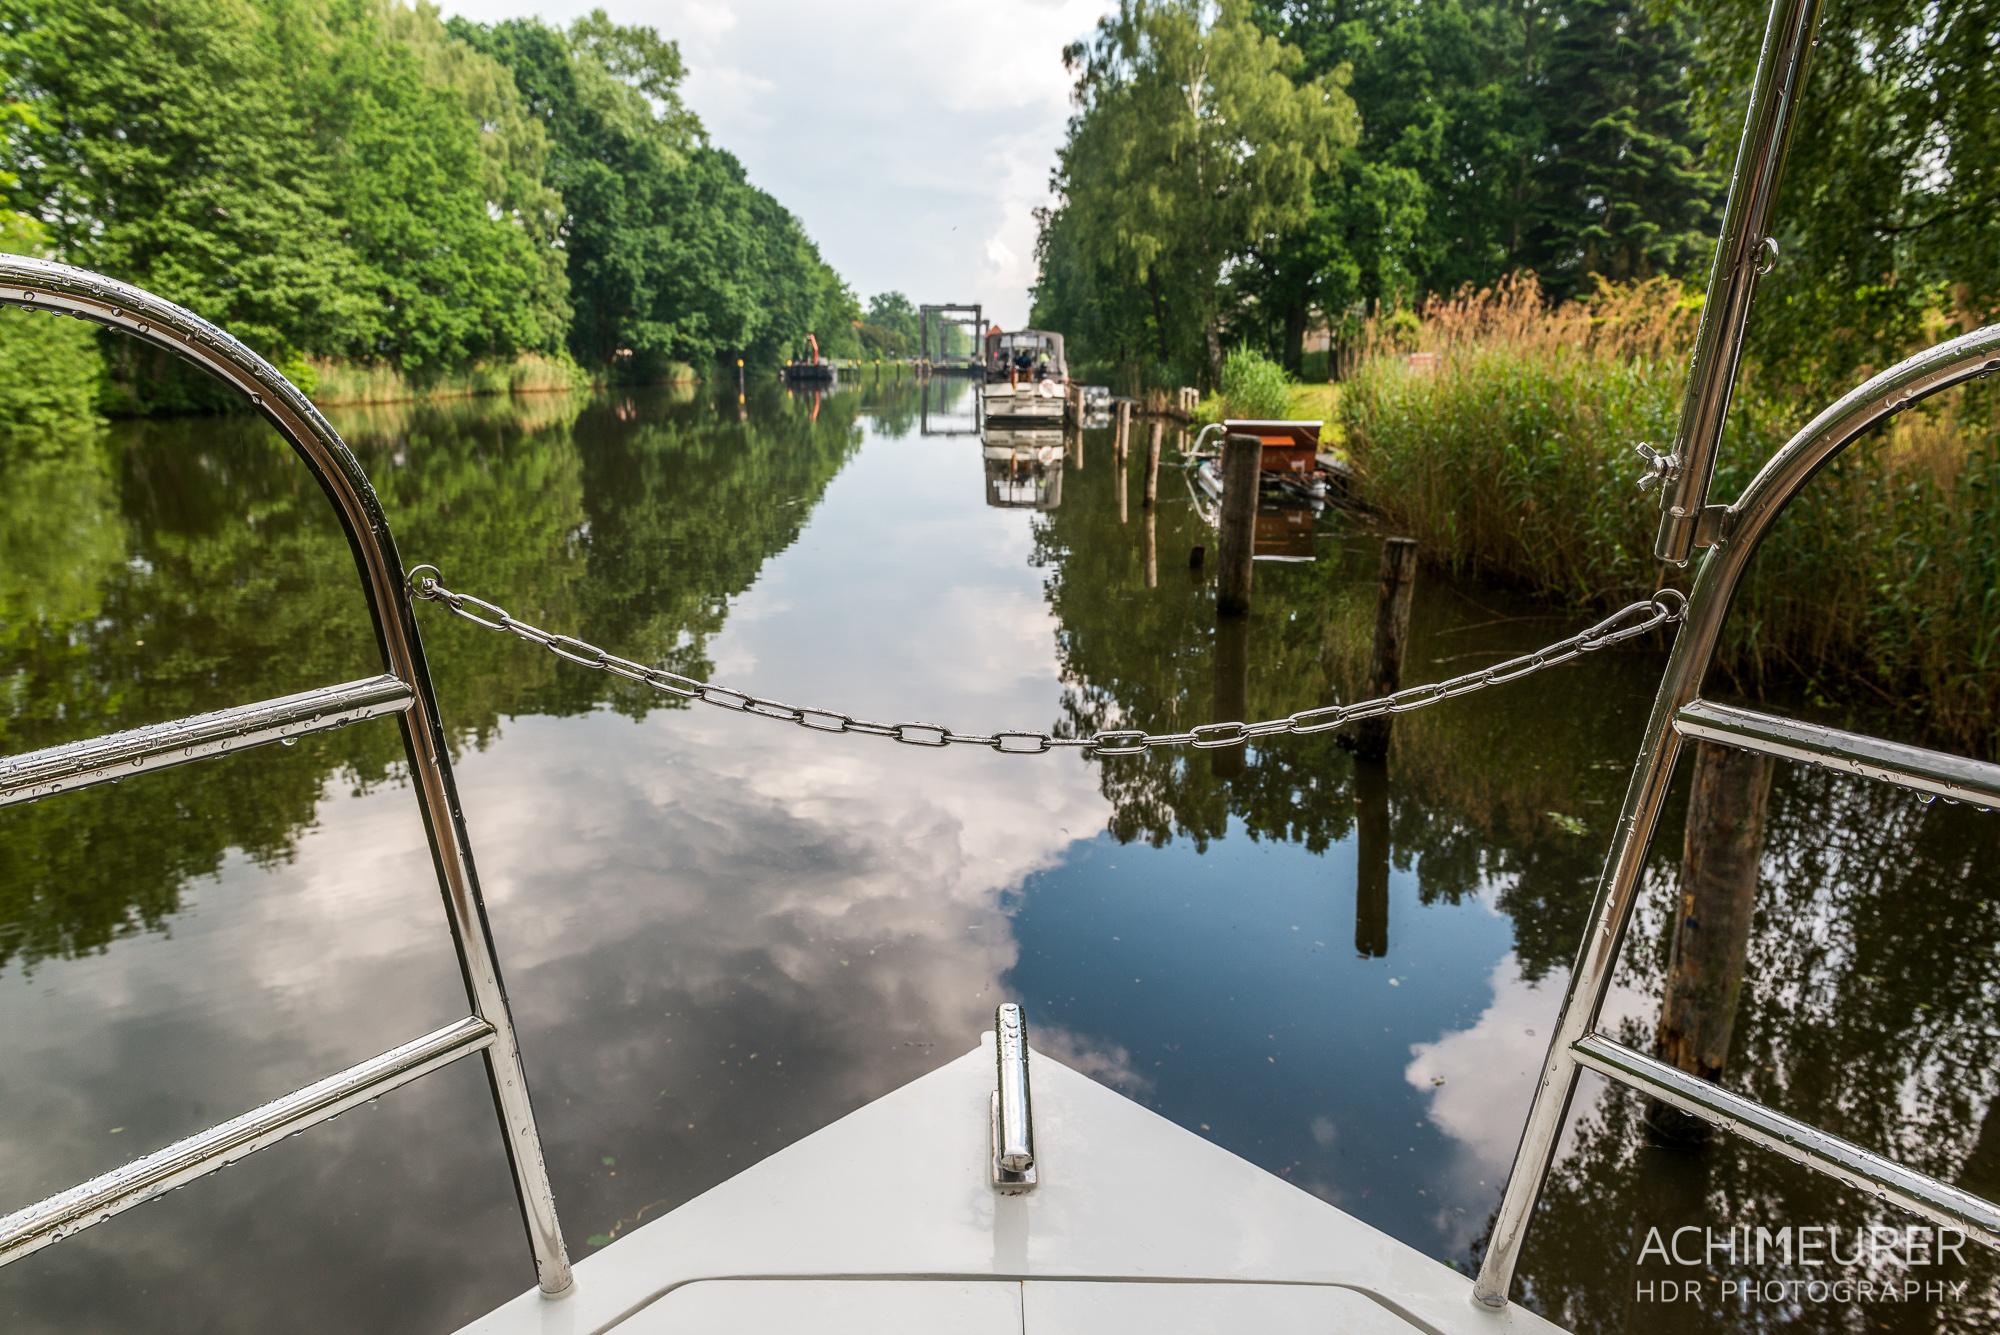 Hausboot-Kuhnle-Mueritz-Mecklenburg-Vorpommern-See_2594